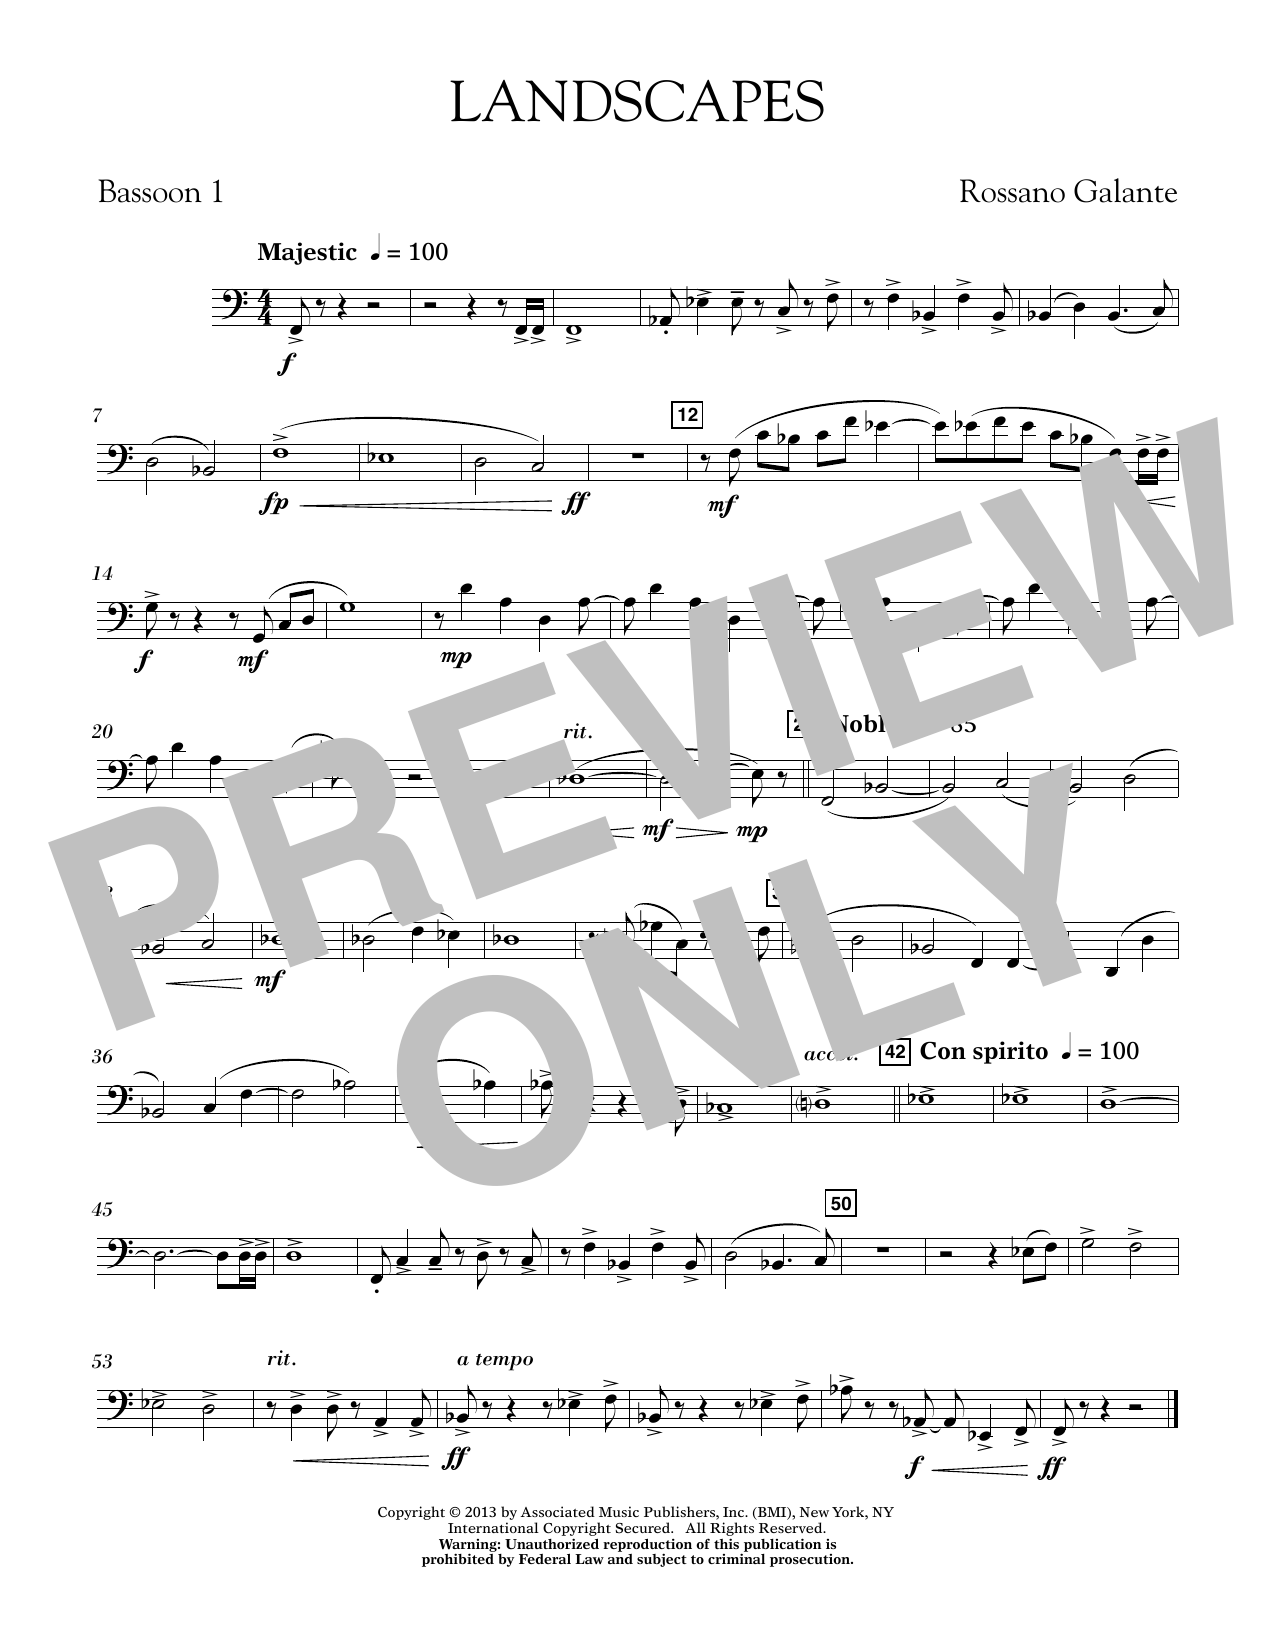 Rosanno Galante Landscapes - Bassoon 1 sheet music notes printable PDF score